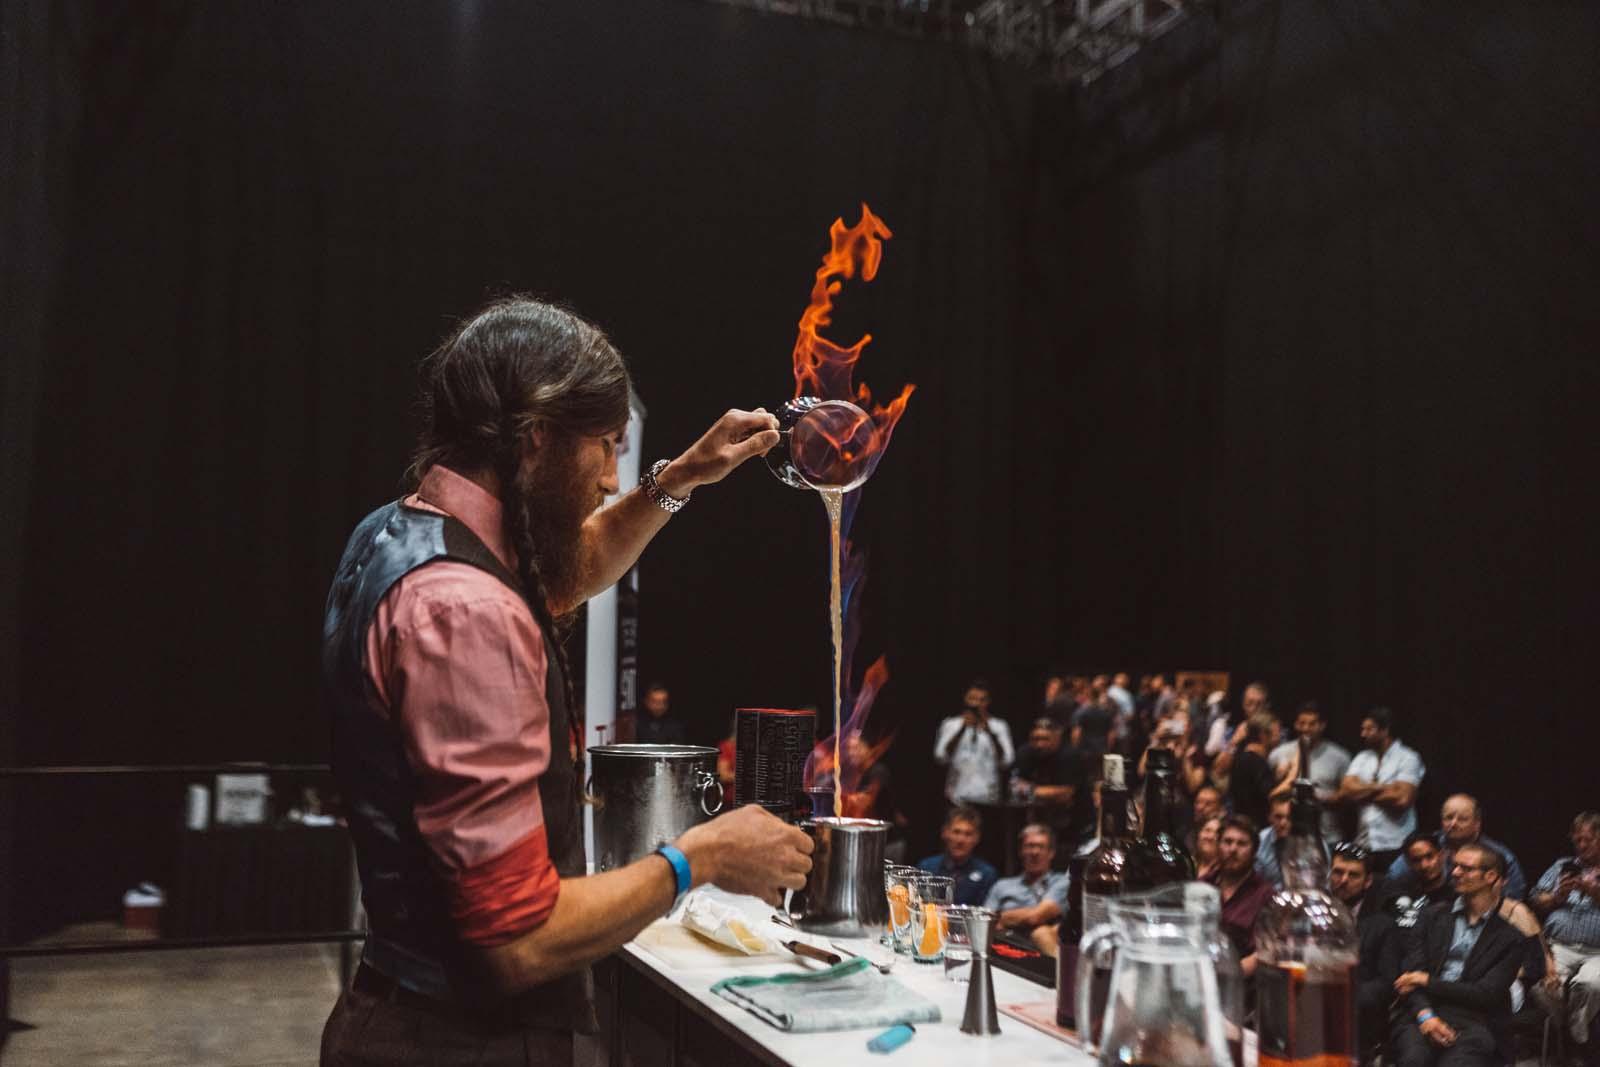 Dramfest 2018 for Whisky Galore-64.jpg